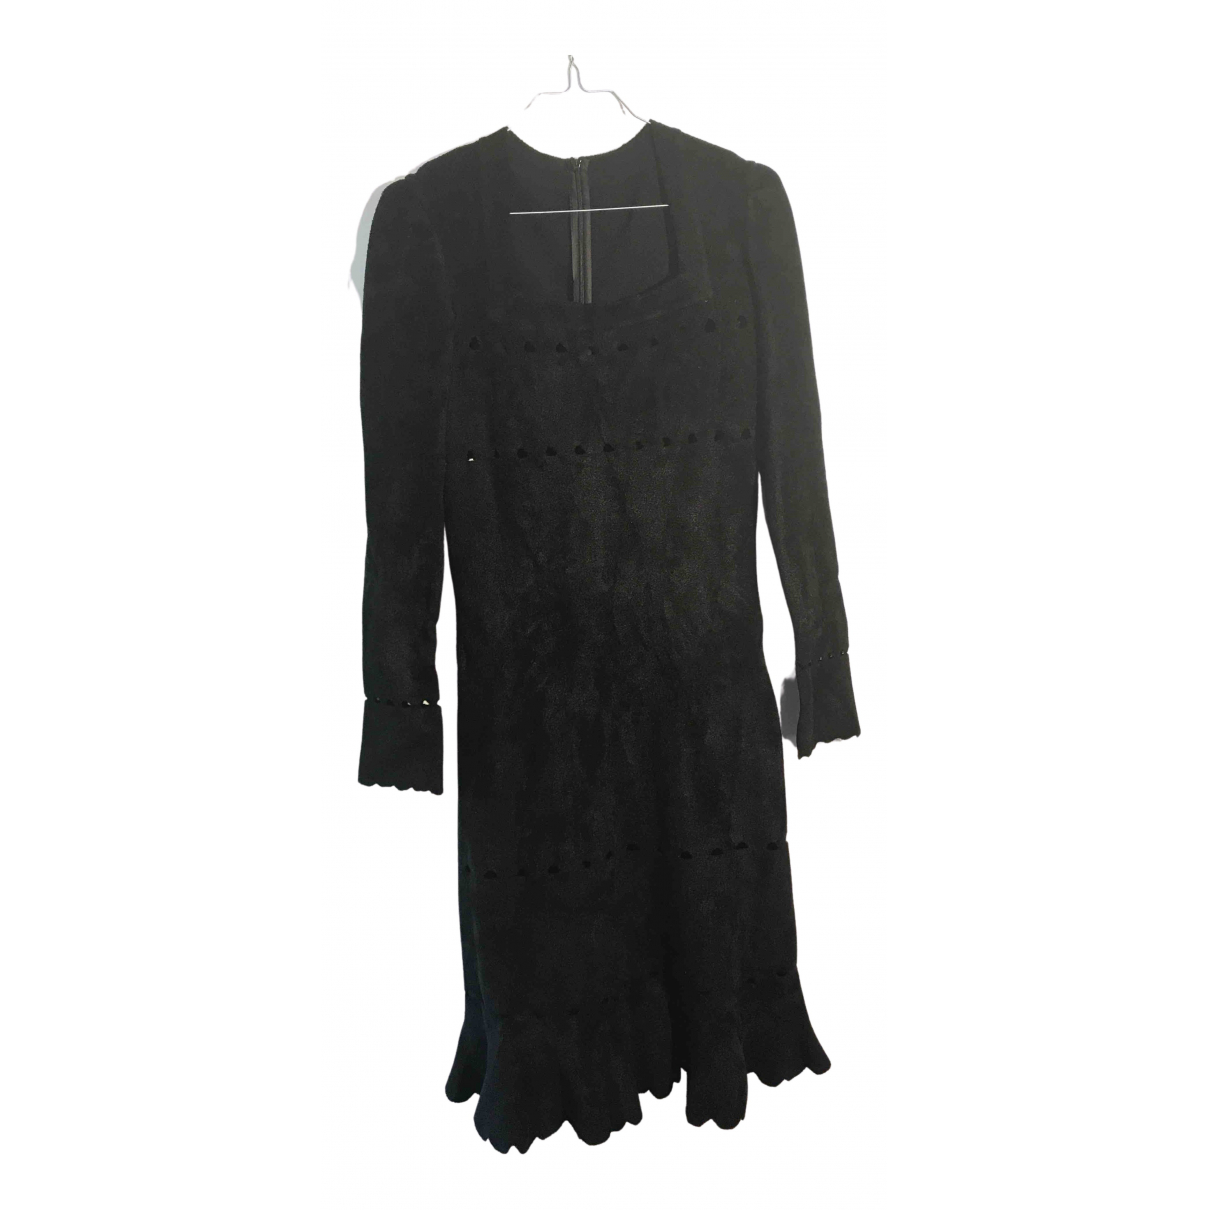 Alaia \N Kleid in  Schwarz Synthetik